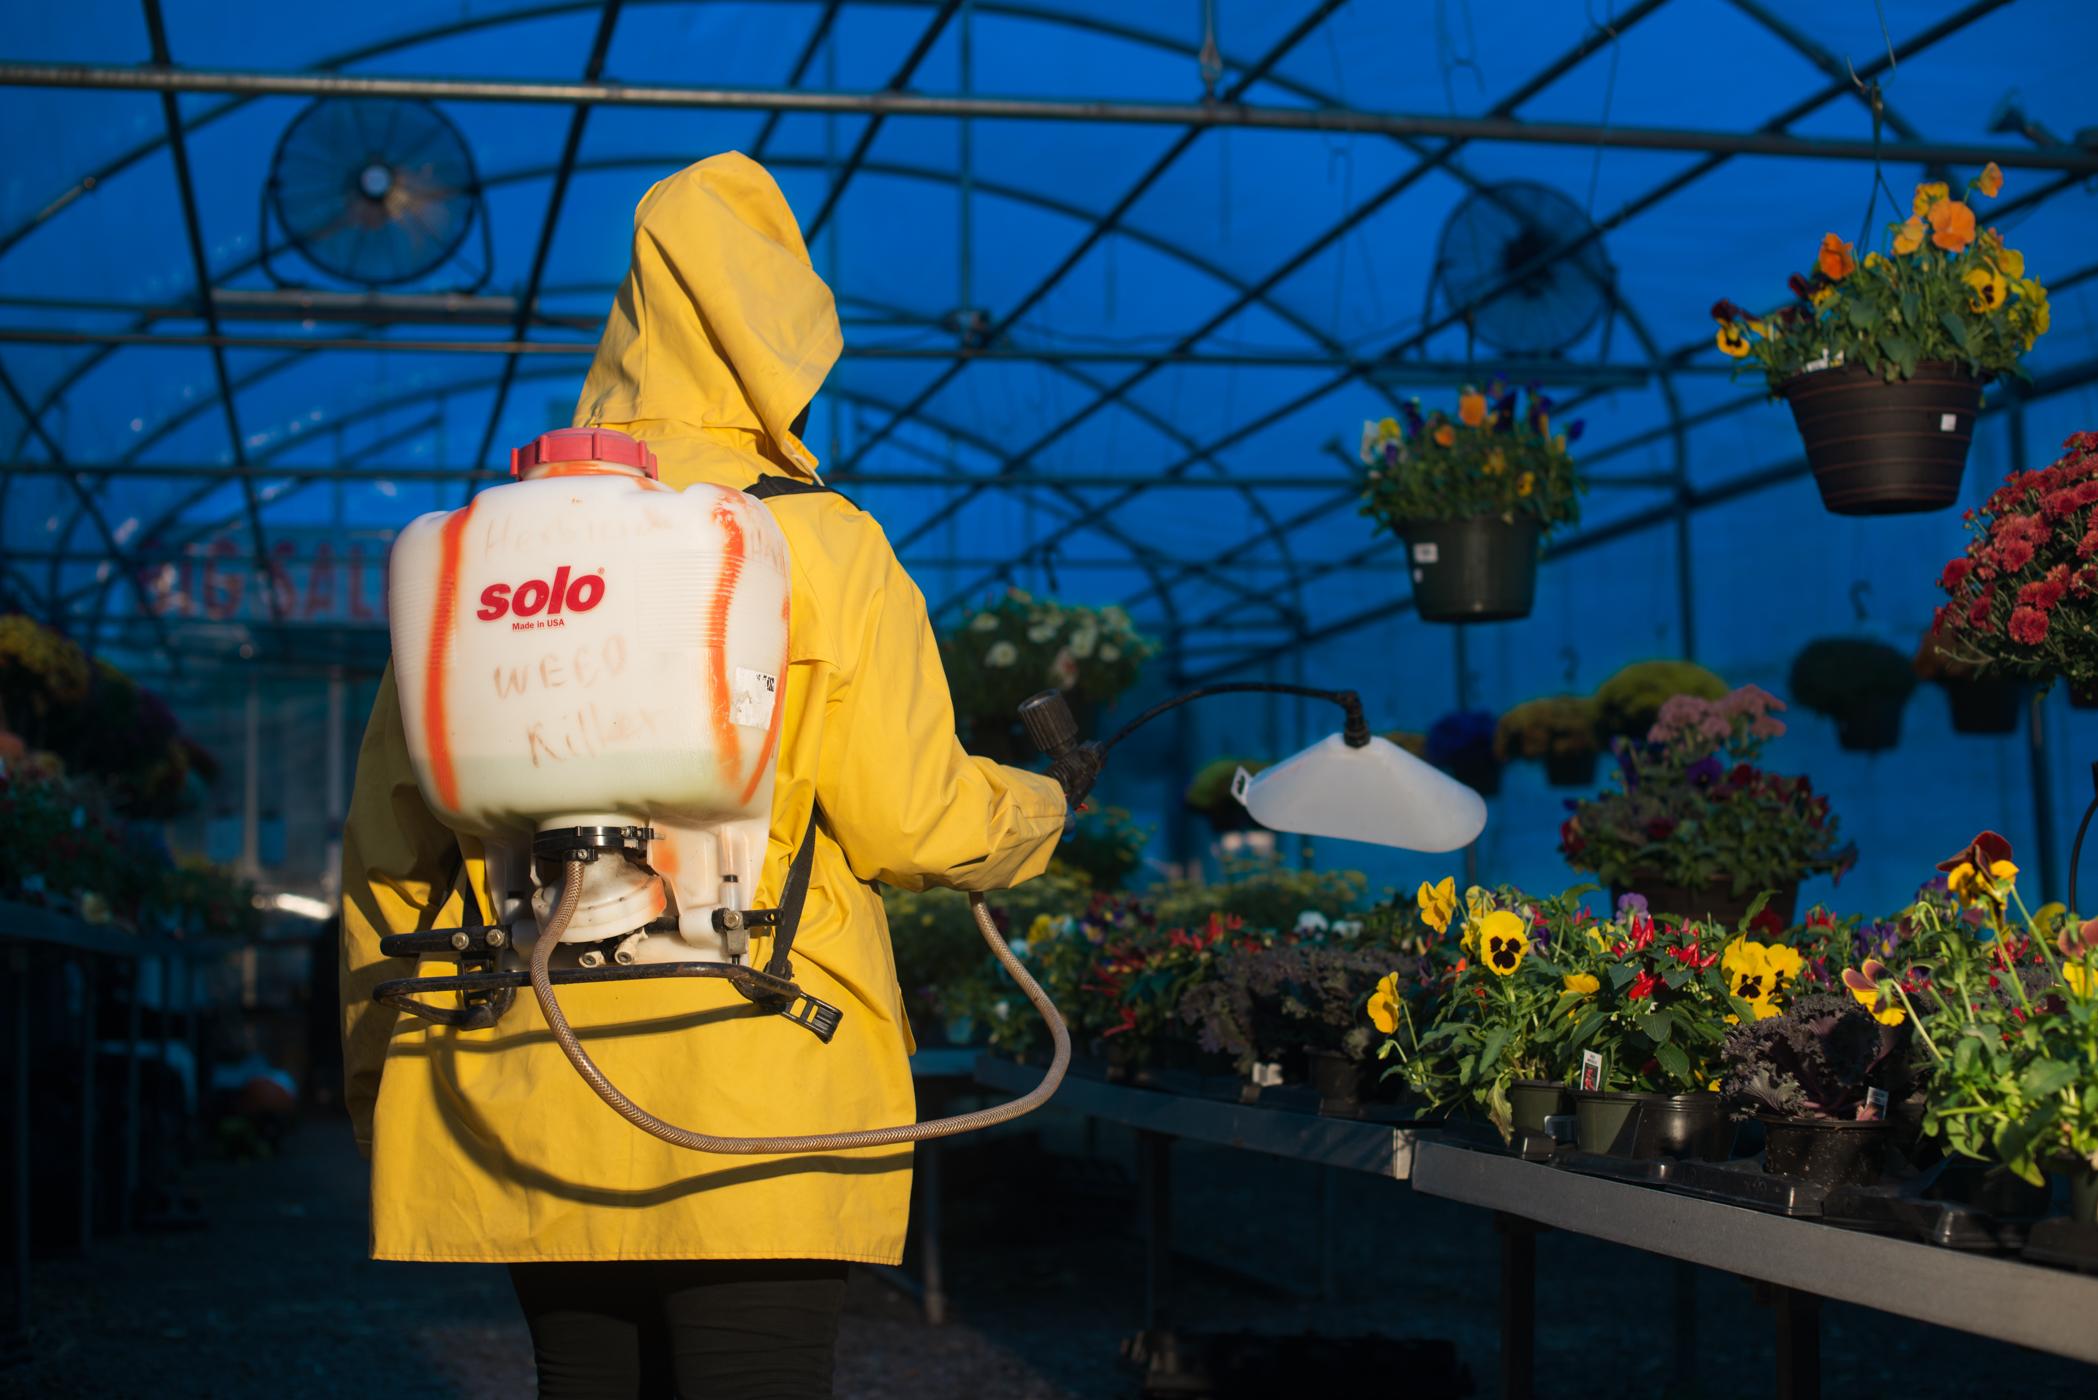 Solo Herbicide Preemergence , 2016